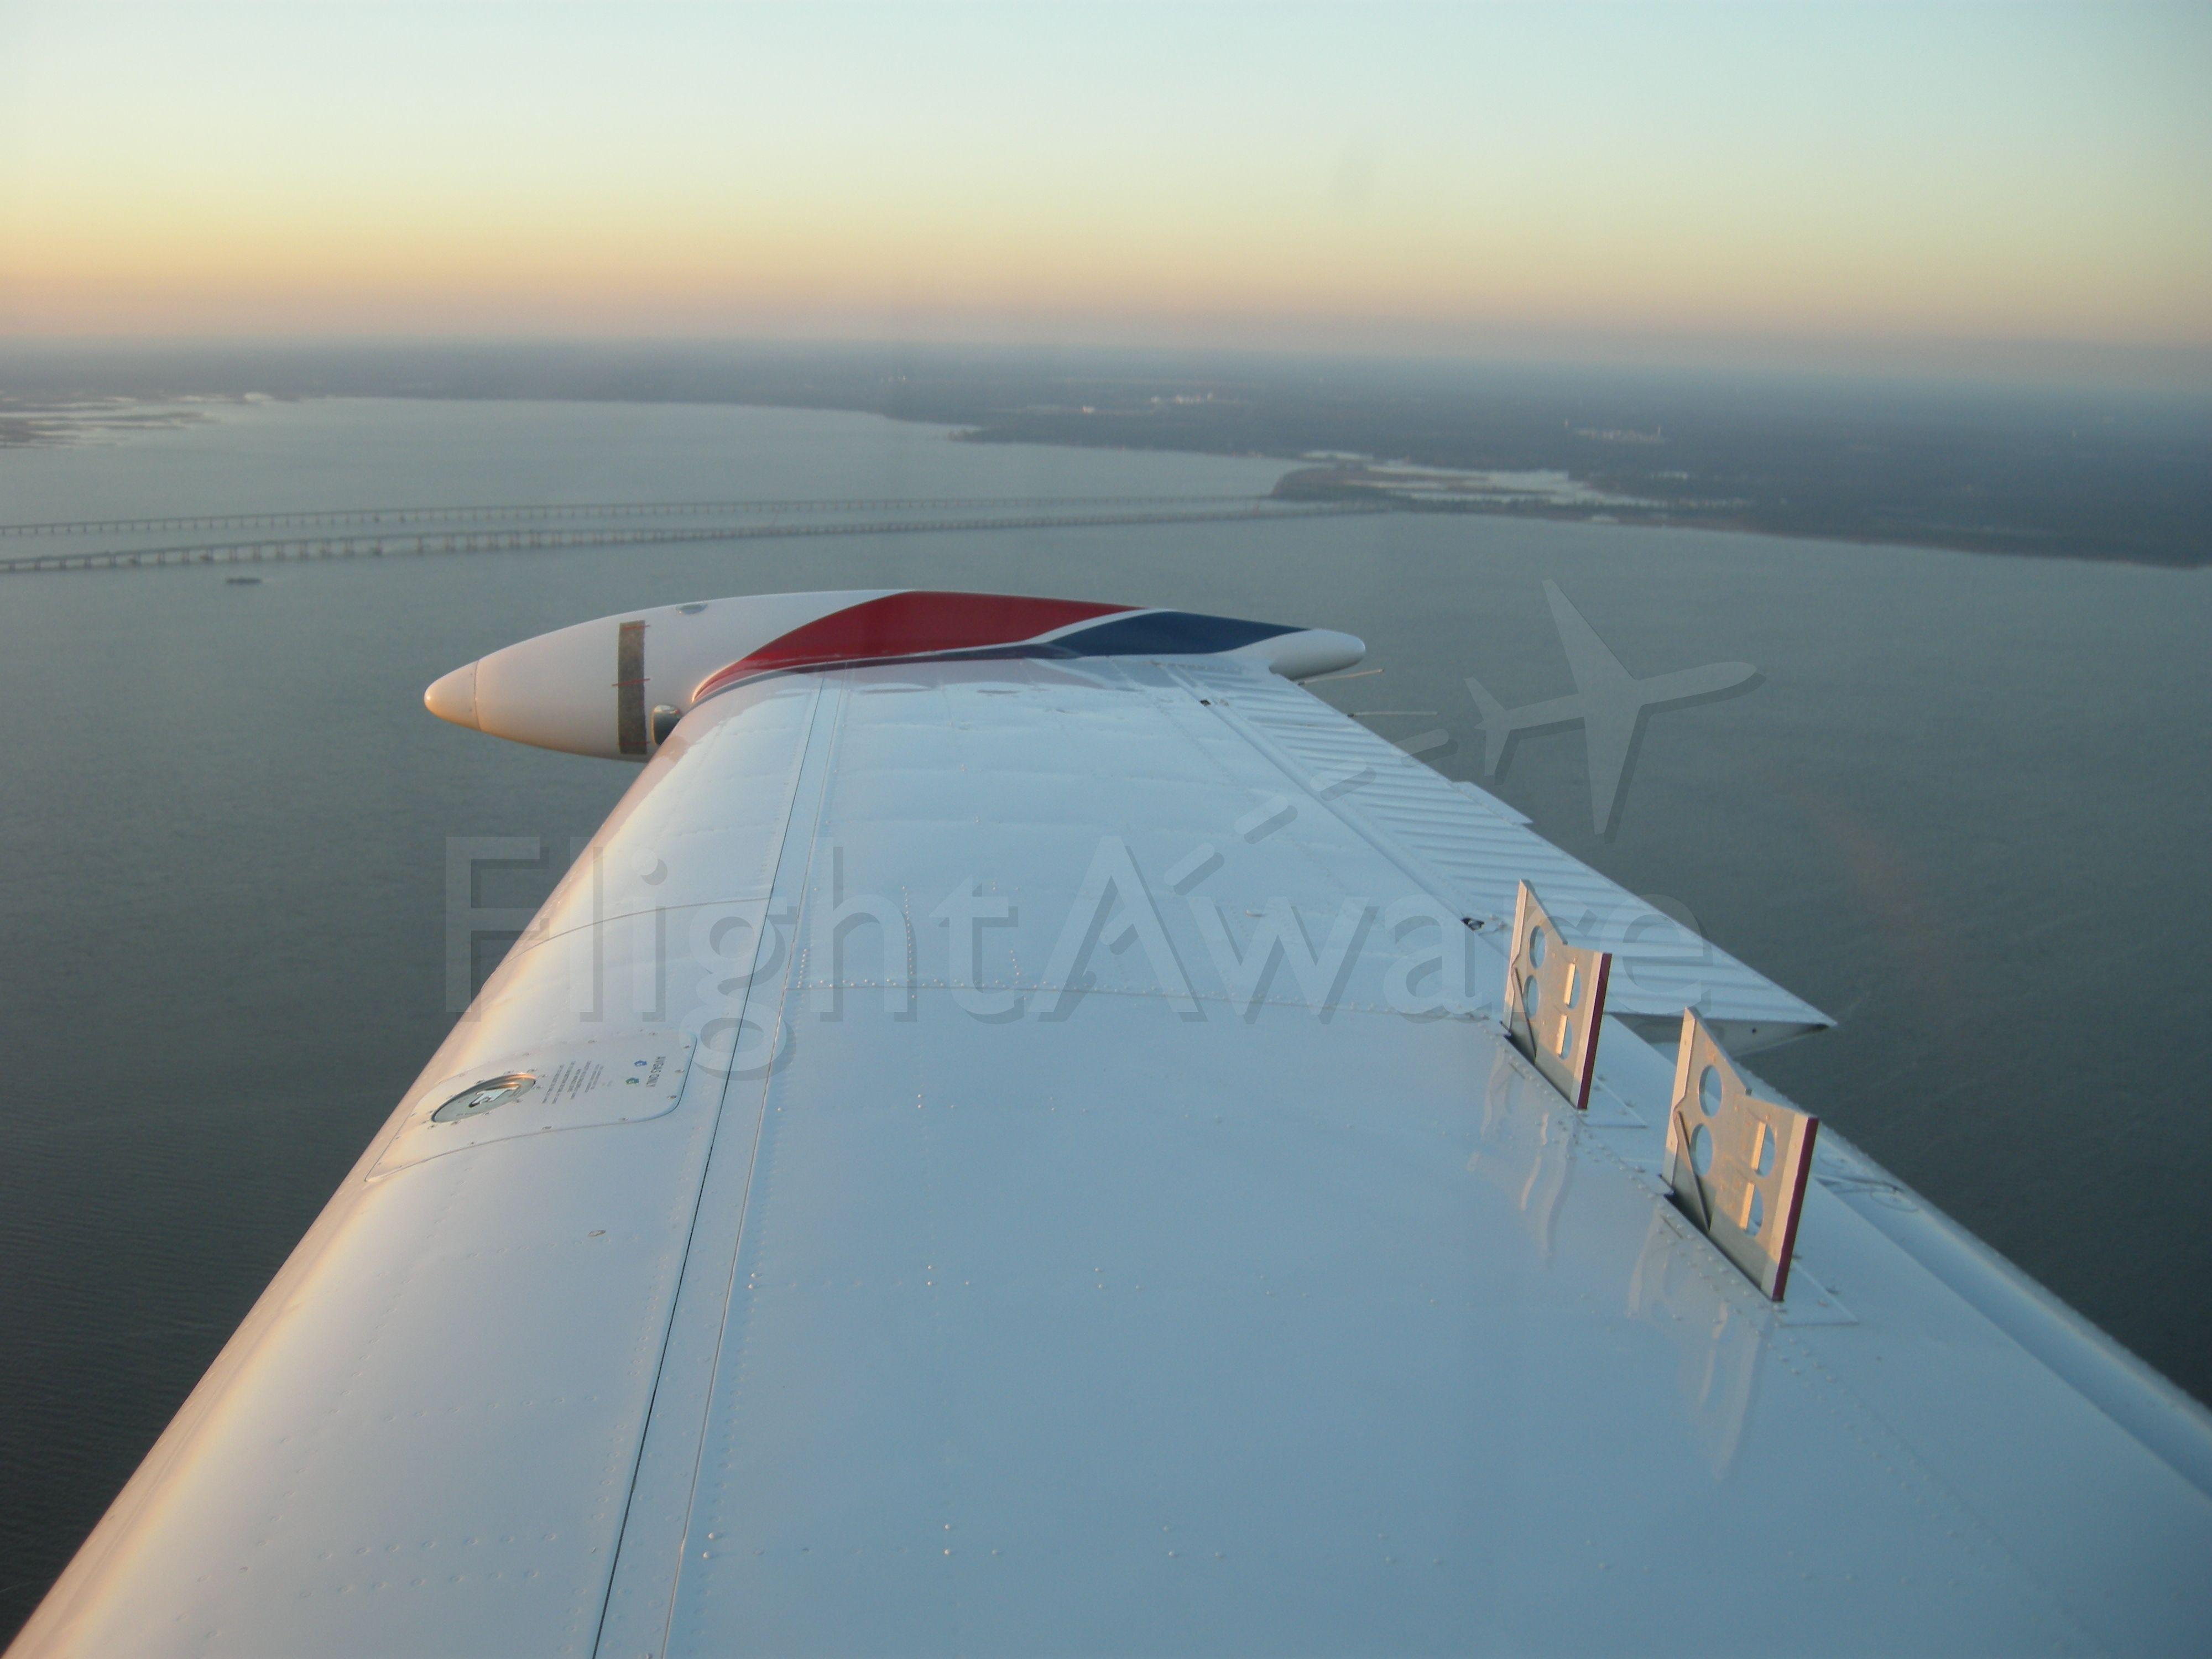 Beechcraft Bonanza (33) (N72JK) - Using the spoilers!